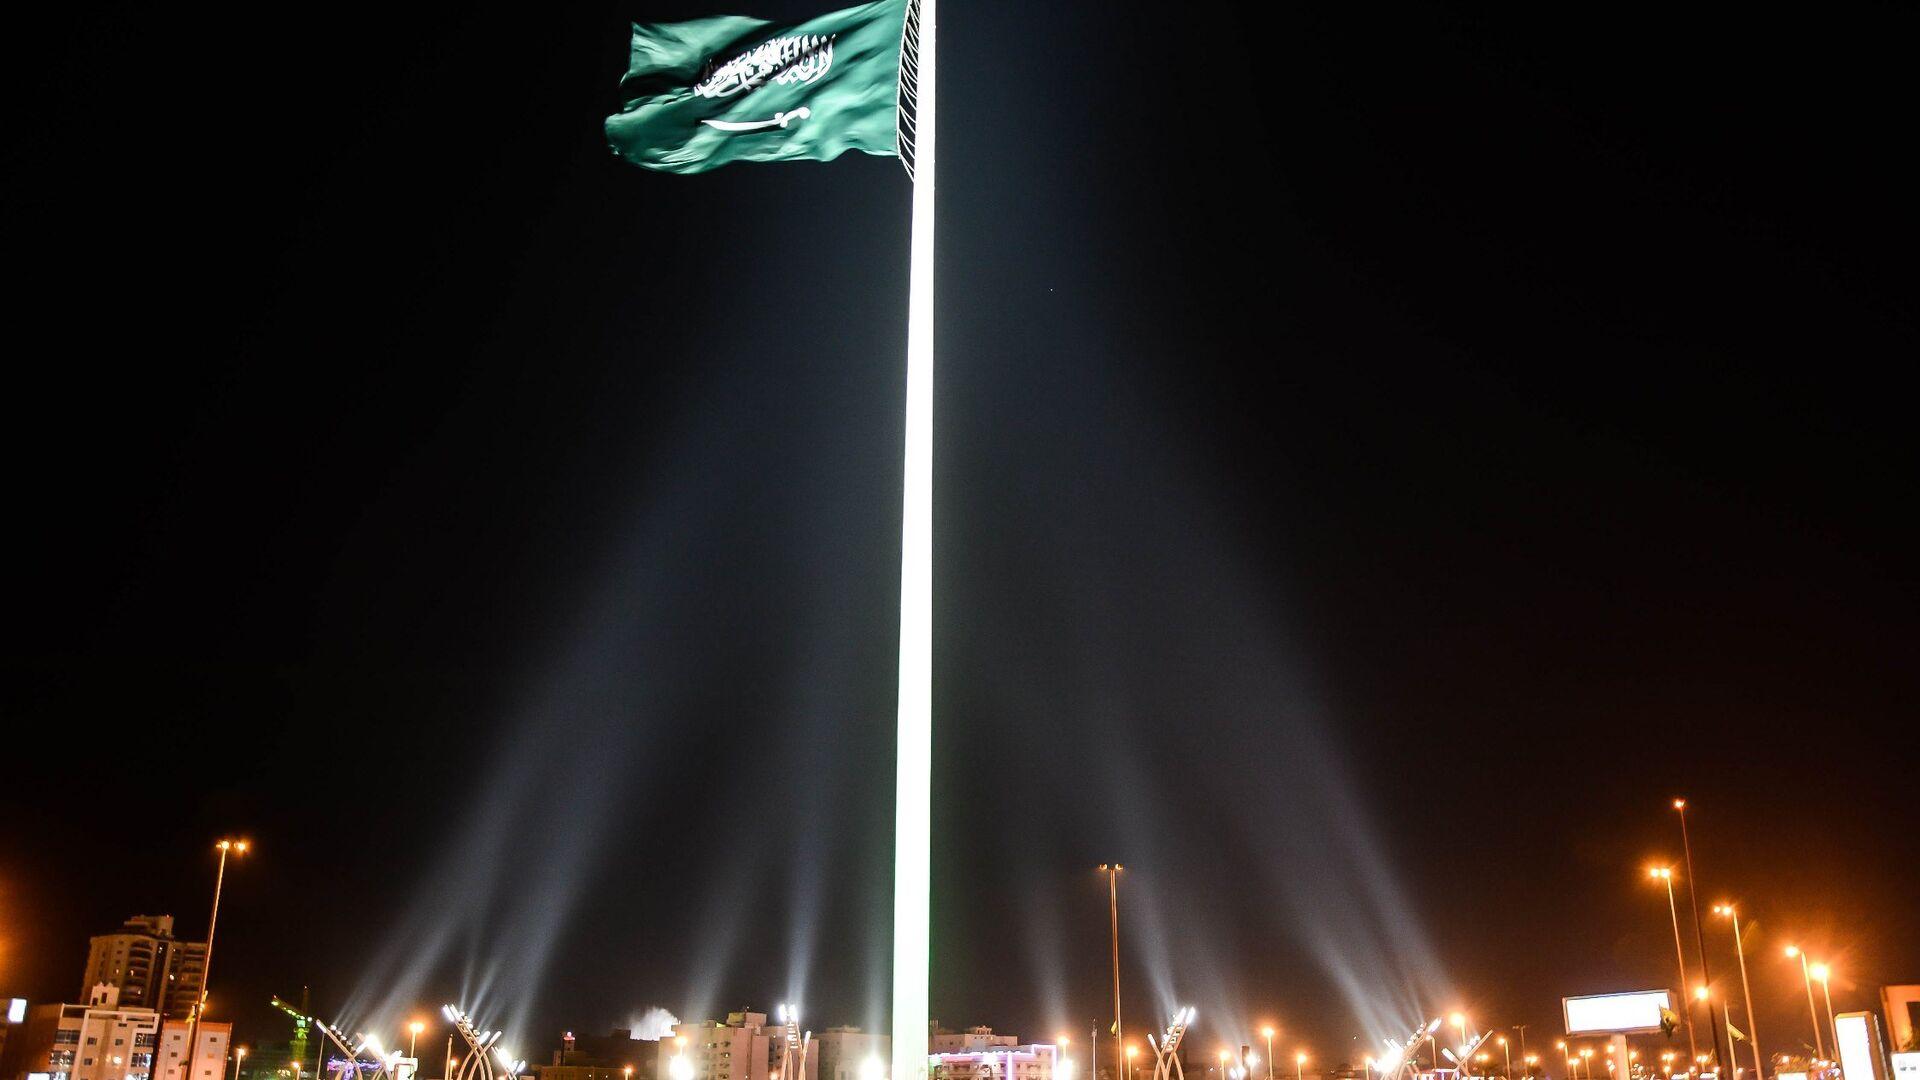 La bandera de Arabia Saudí - Sputnik Mundo, 1920, 27.02.2021